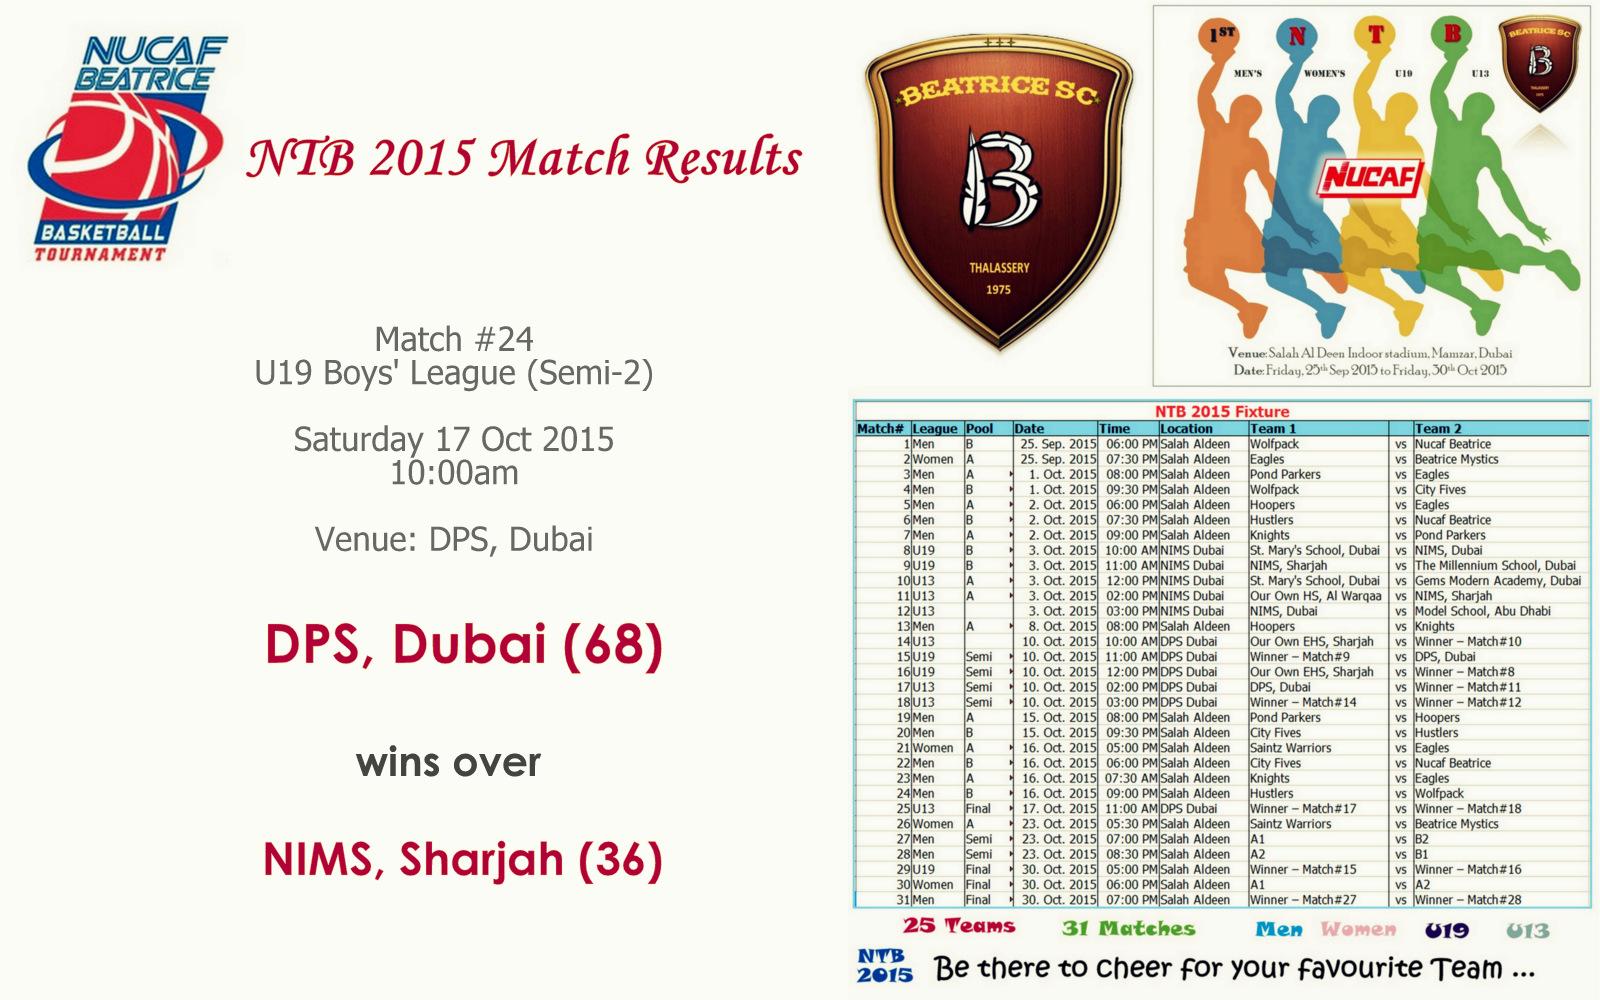 NTB 2015 – Match #24 (U19 Semi 2) | NIMS, Sharjah (36) Vs DPS, Dubai (68)